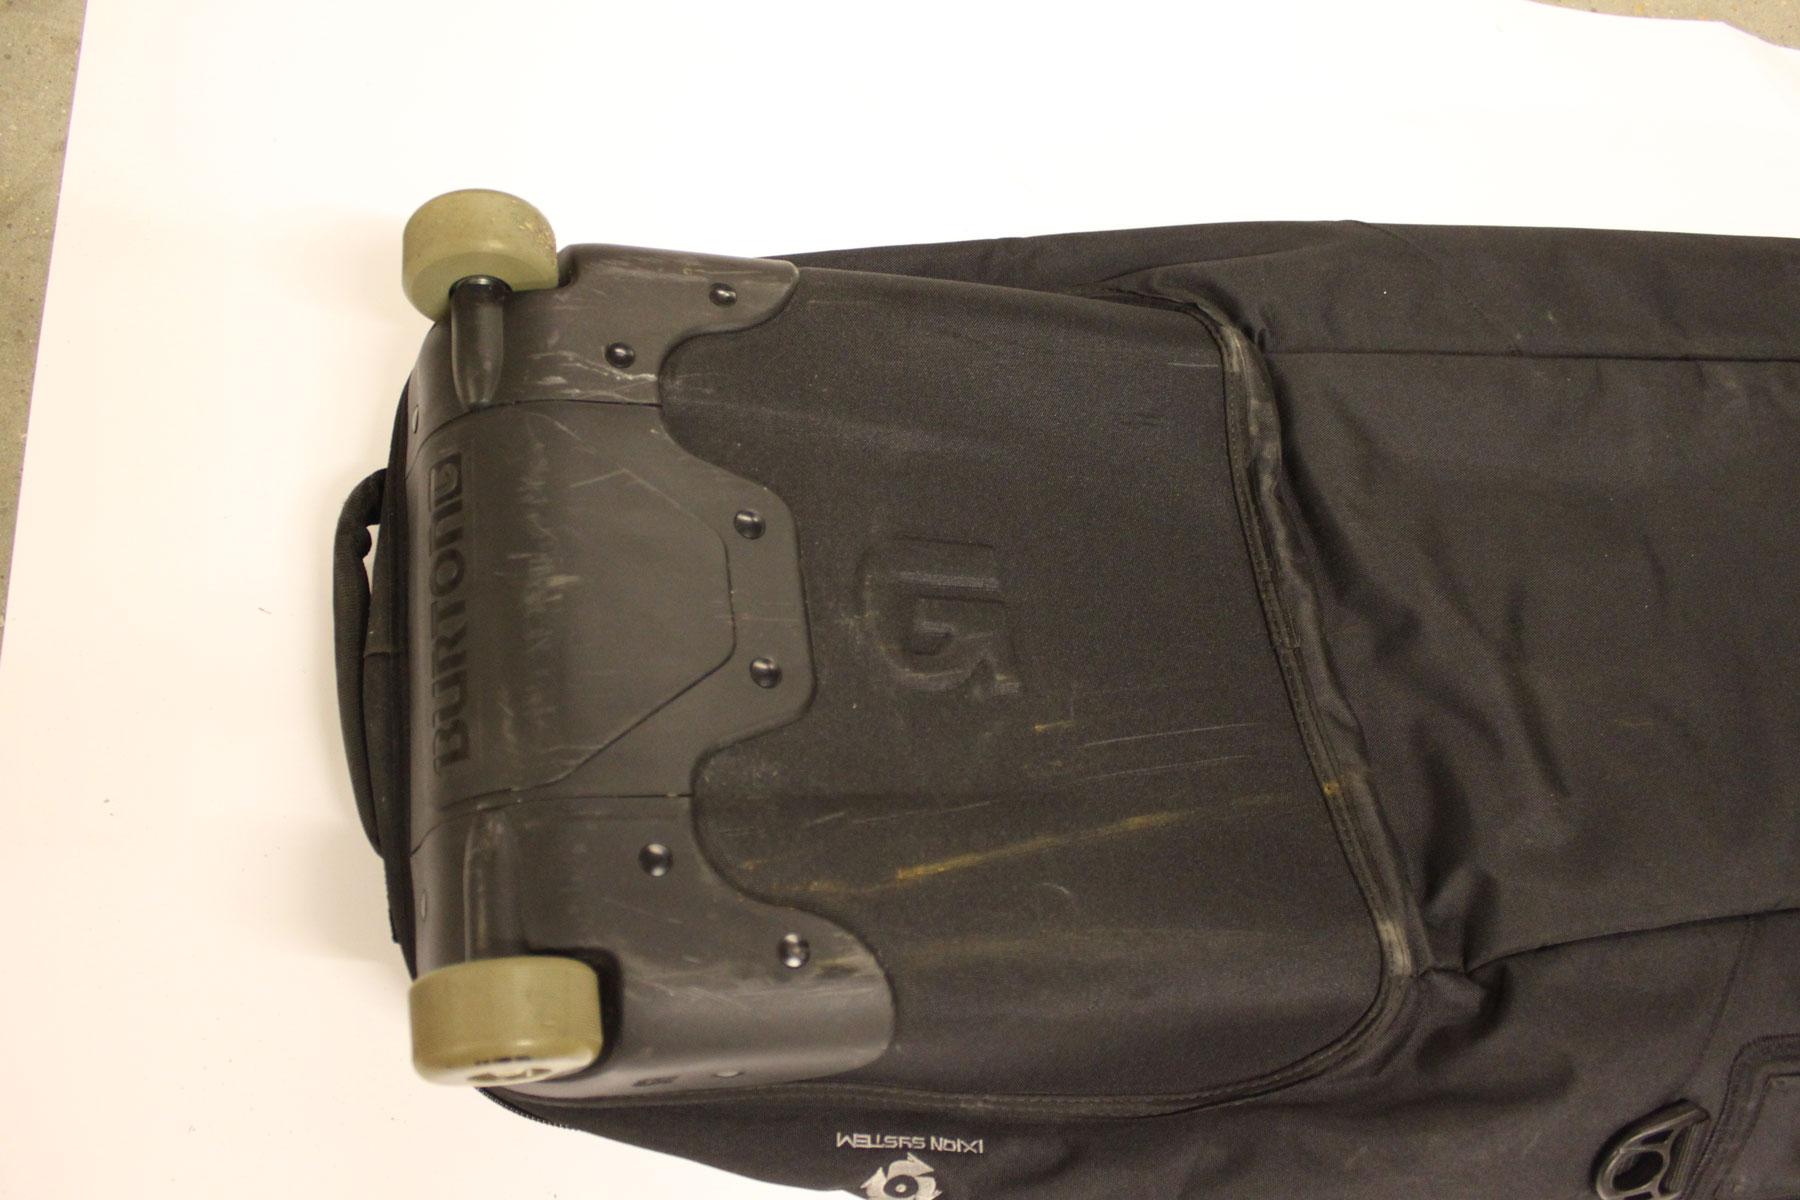 Used Burton Snowboard Bag with Wheels – Black – Very Good Condition 8 10 0414e4b00bb11